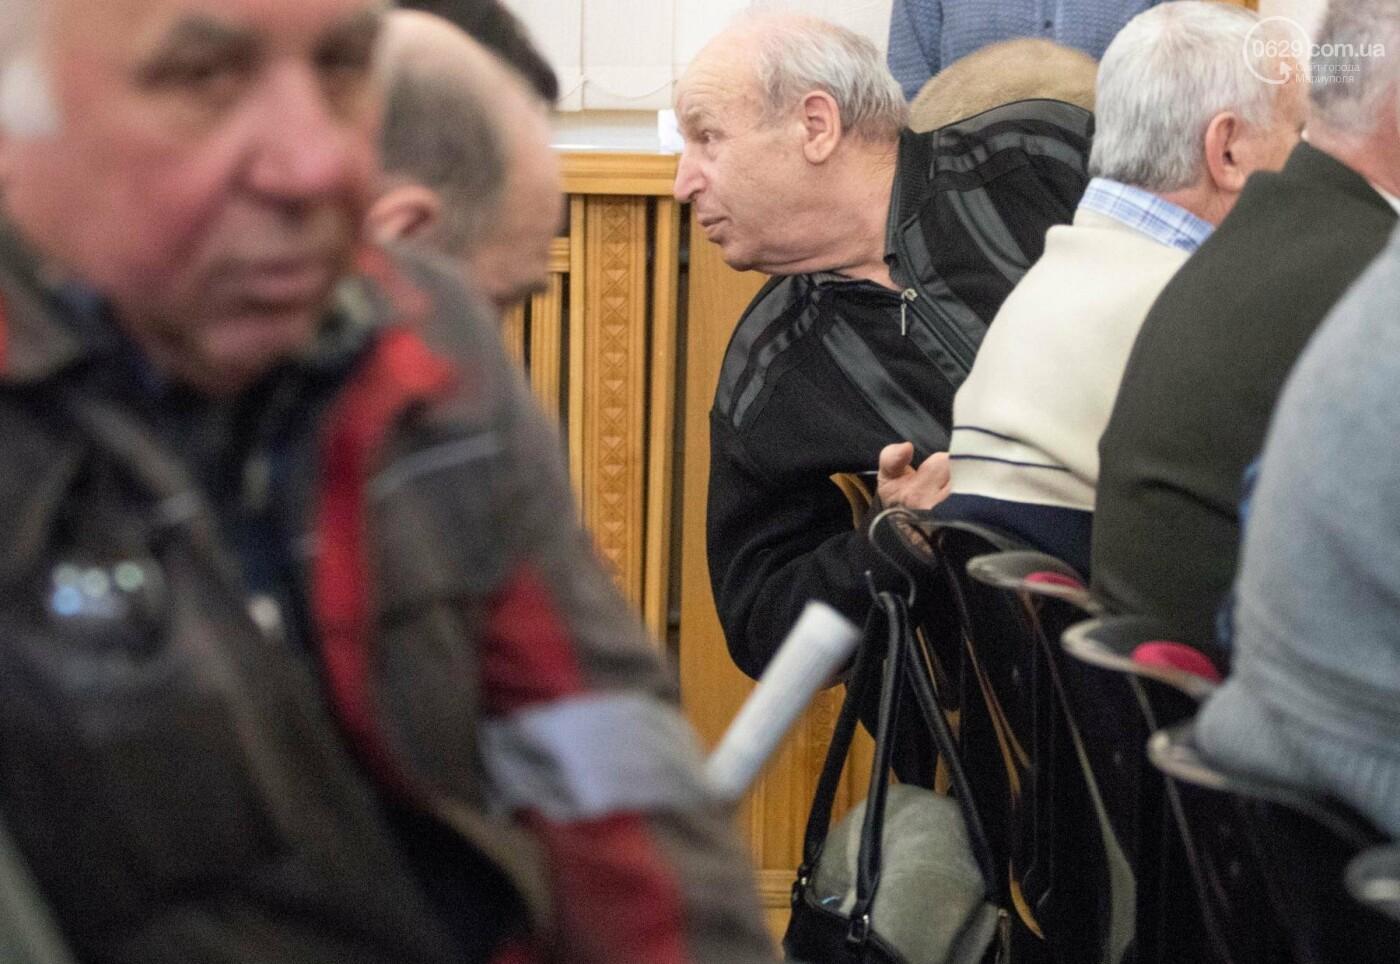 В Мариуполе Гройсман пообещал металлургам справедливые пенсии (ФОТО), фото-2